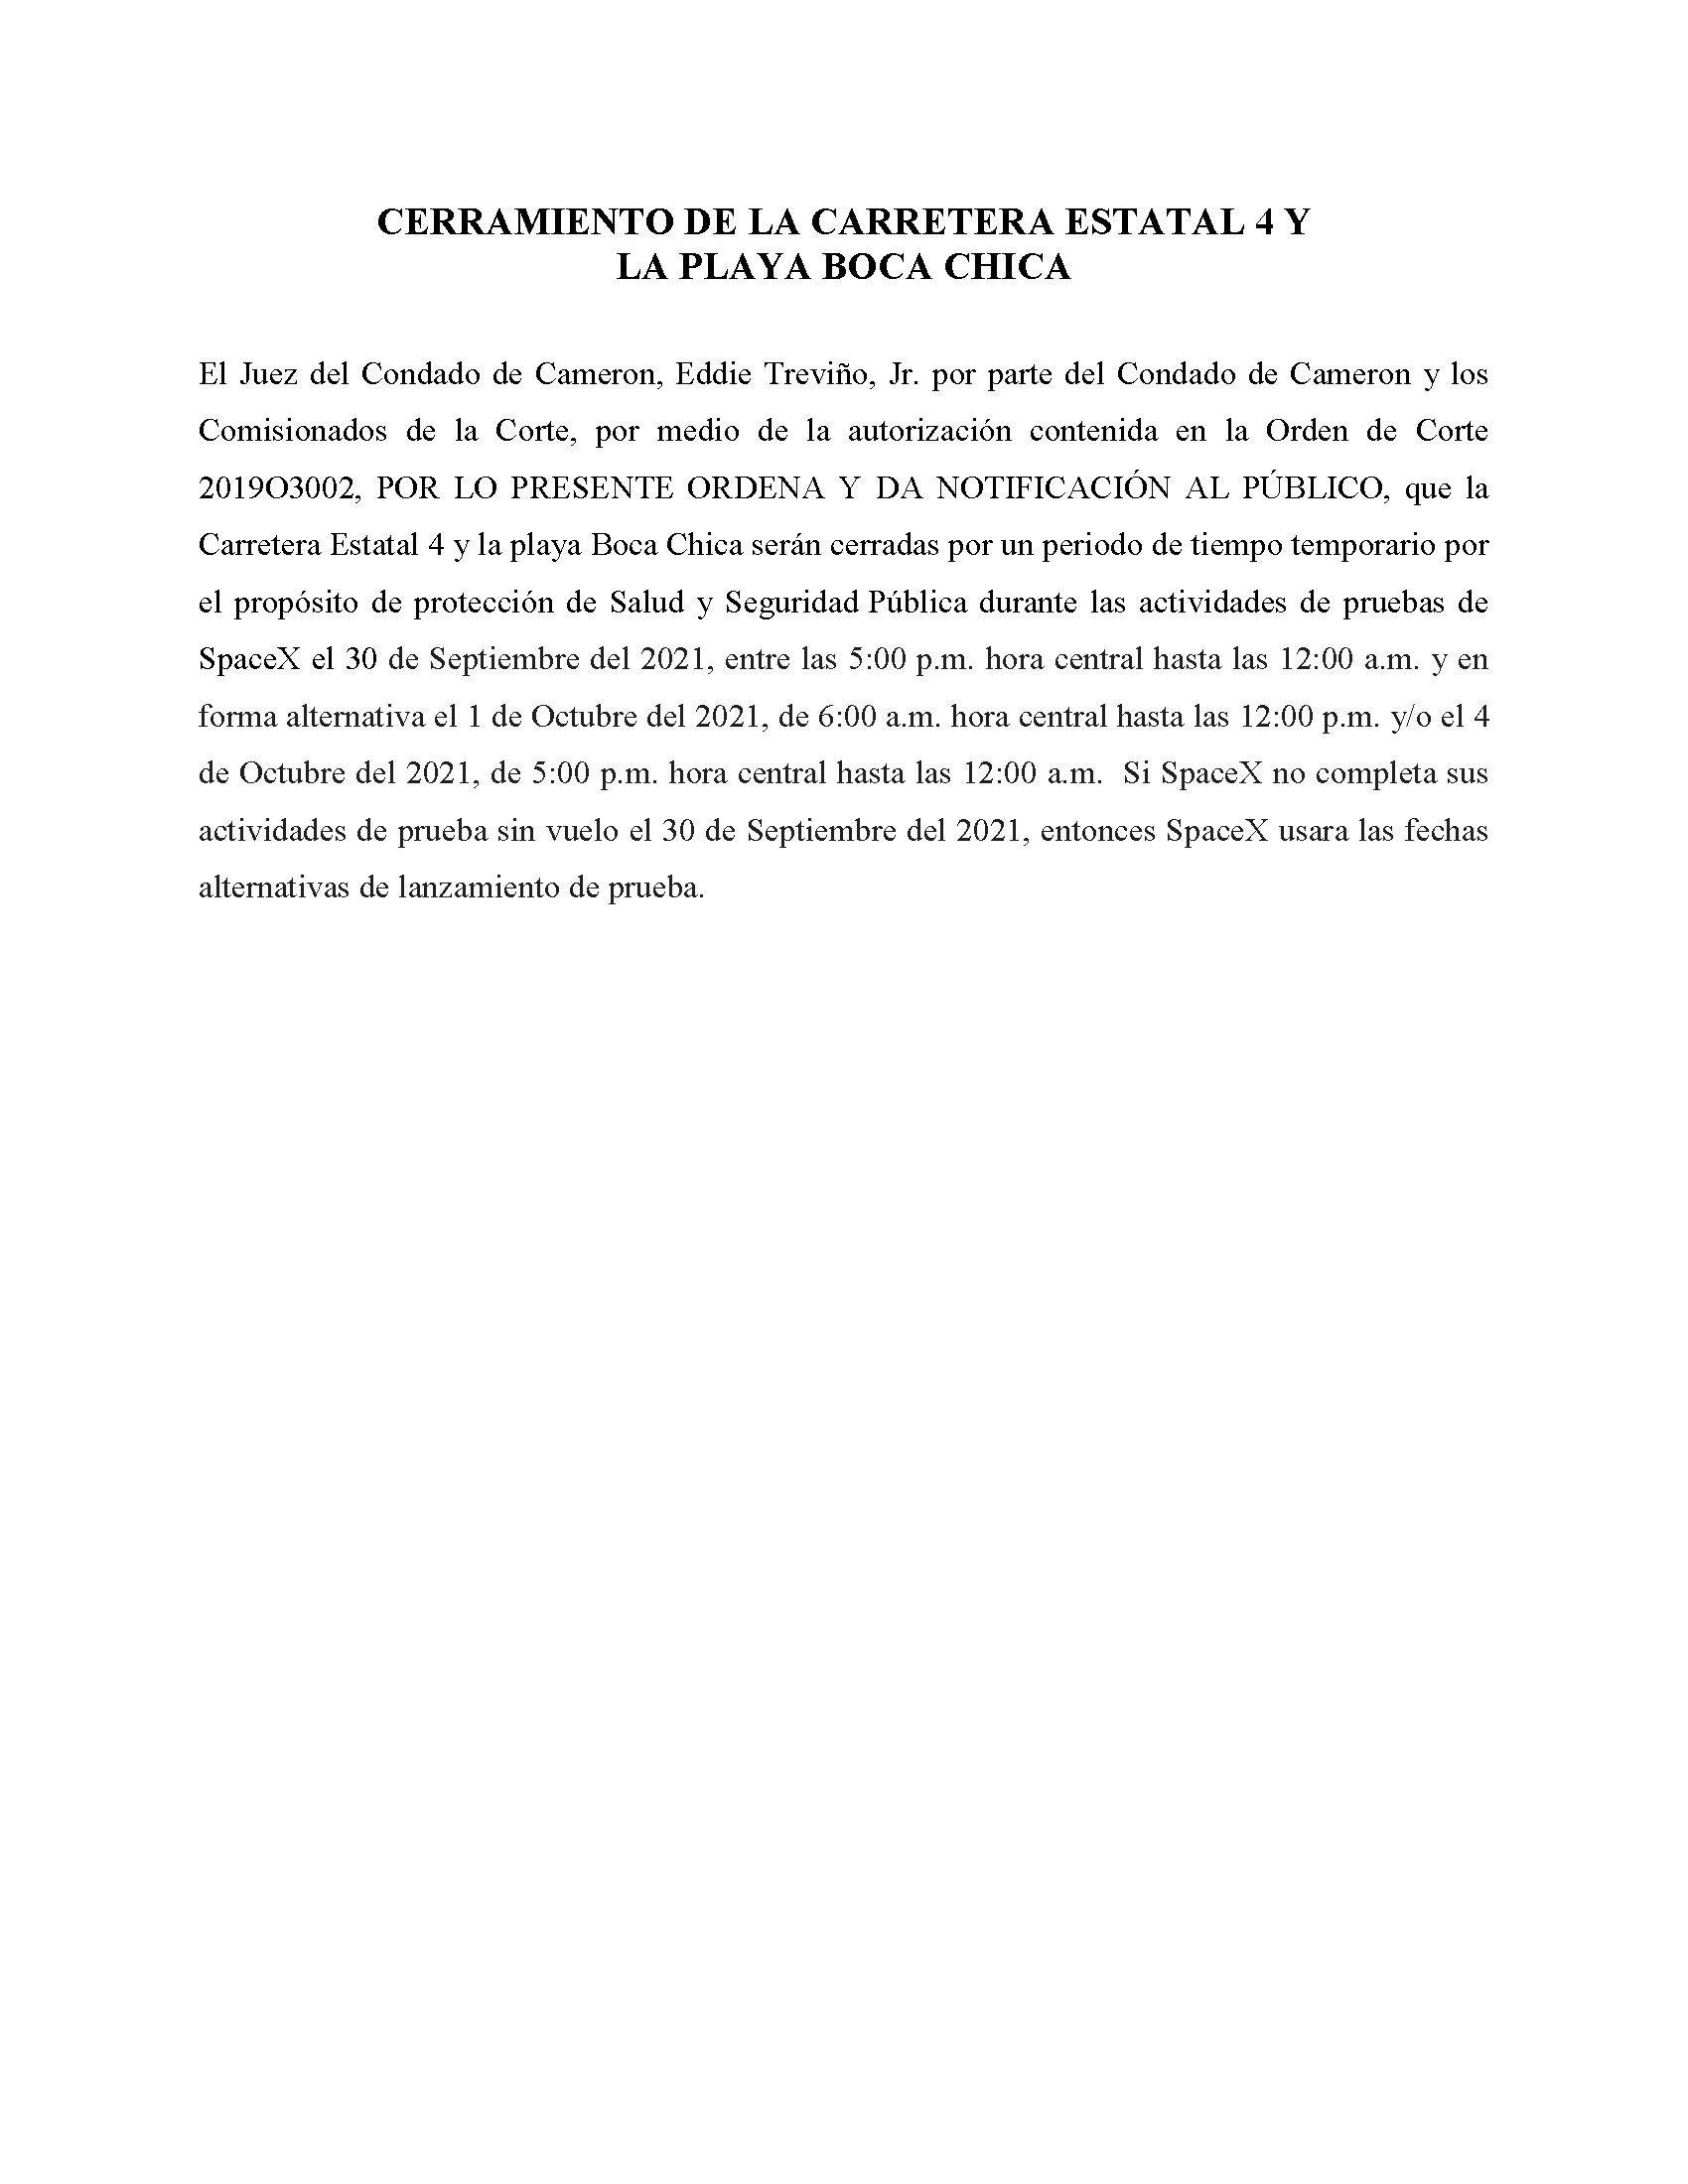 ORDER.CLOSURE OF HIGHWAY 4 Y LA PLAYA BOCA CHICA.SPANISH.09.30.2021